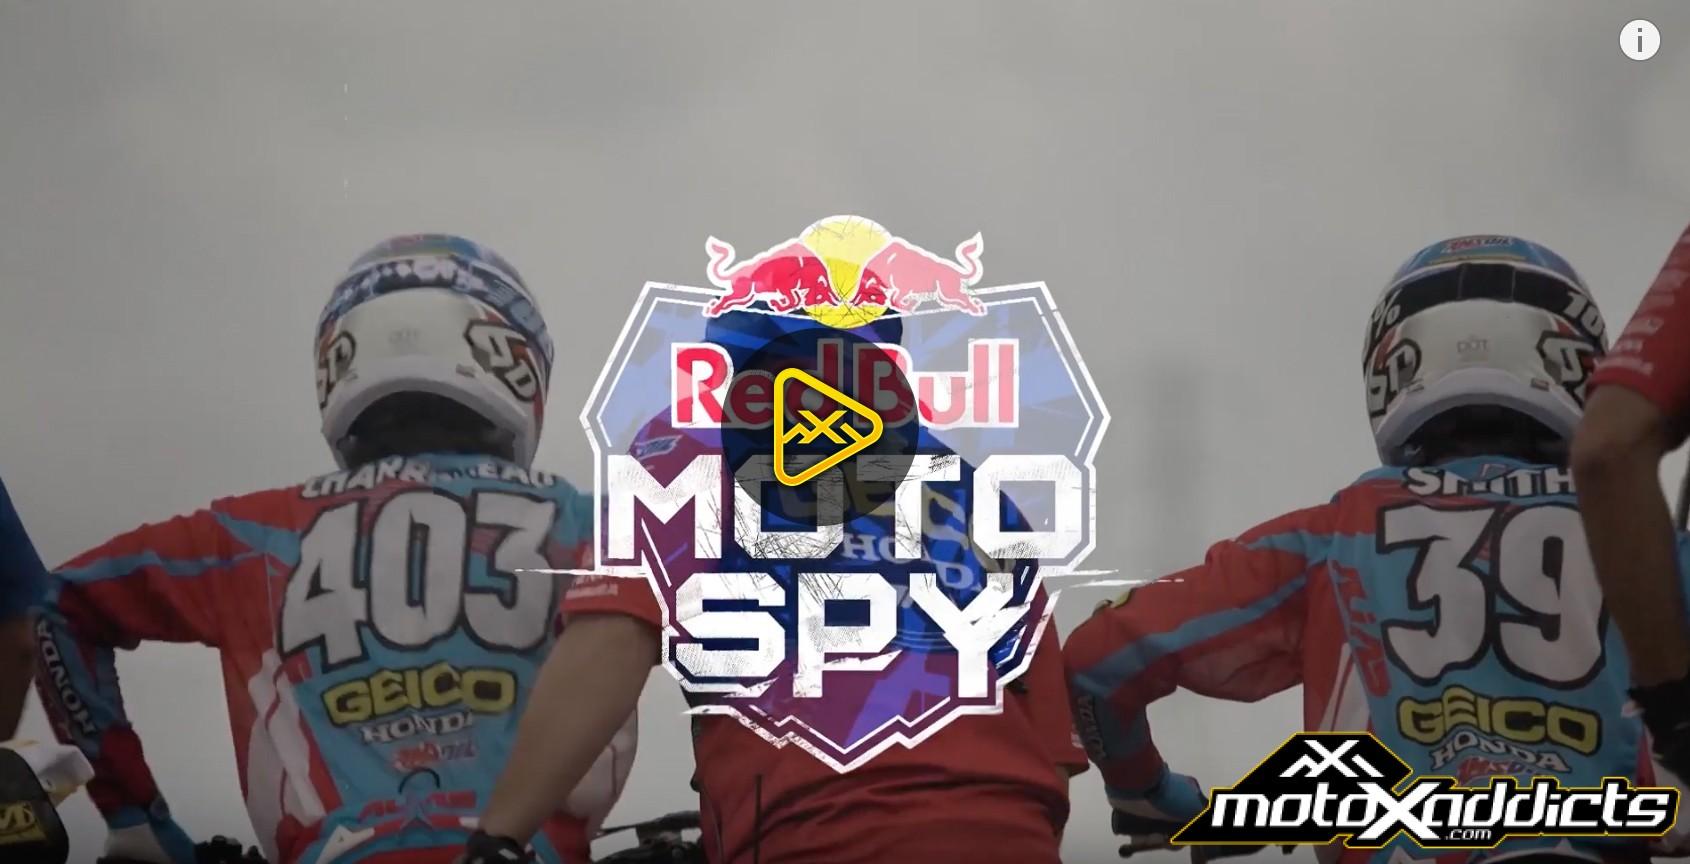 Moto Spy: Tristan Charboneau's First Pro Motocross Race